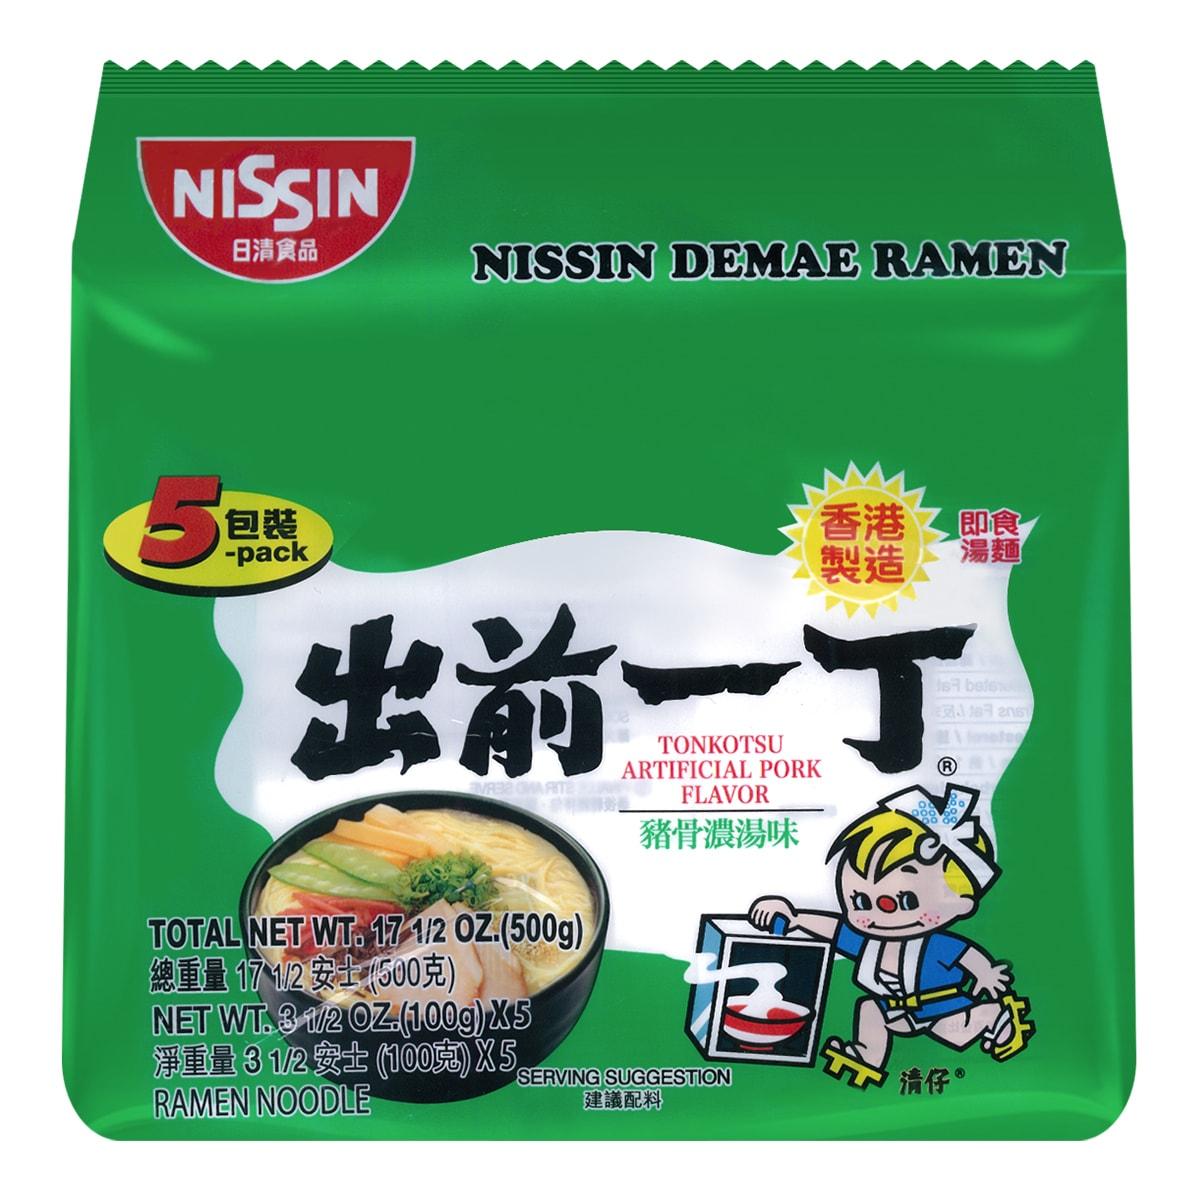 Yamibuy.com:Customer reviews:Demae Ramen Noodle with Soup Base Tonkotsu Pork Flavor 500g